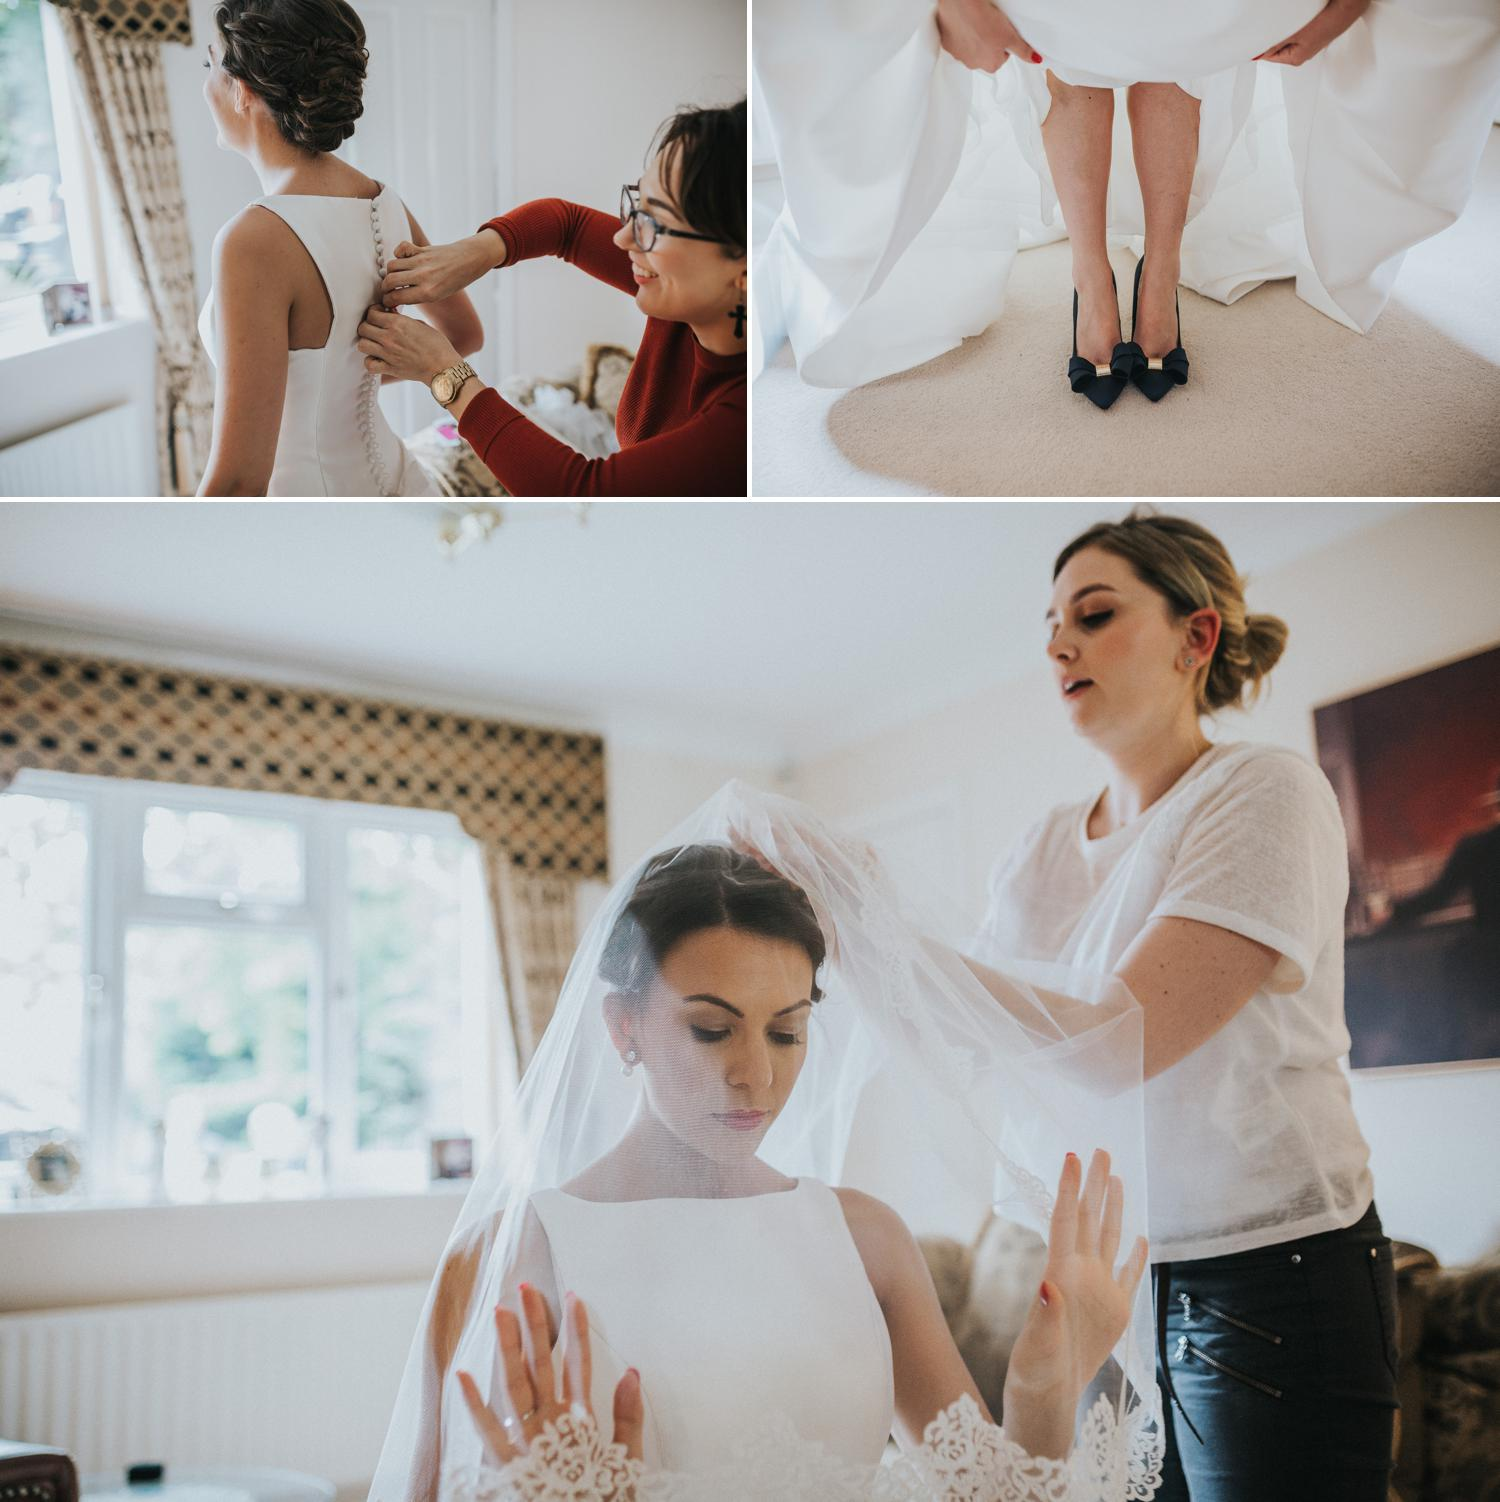 the-citadel-wedding-photography 4.jpg